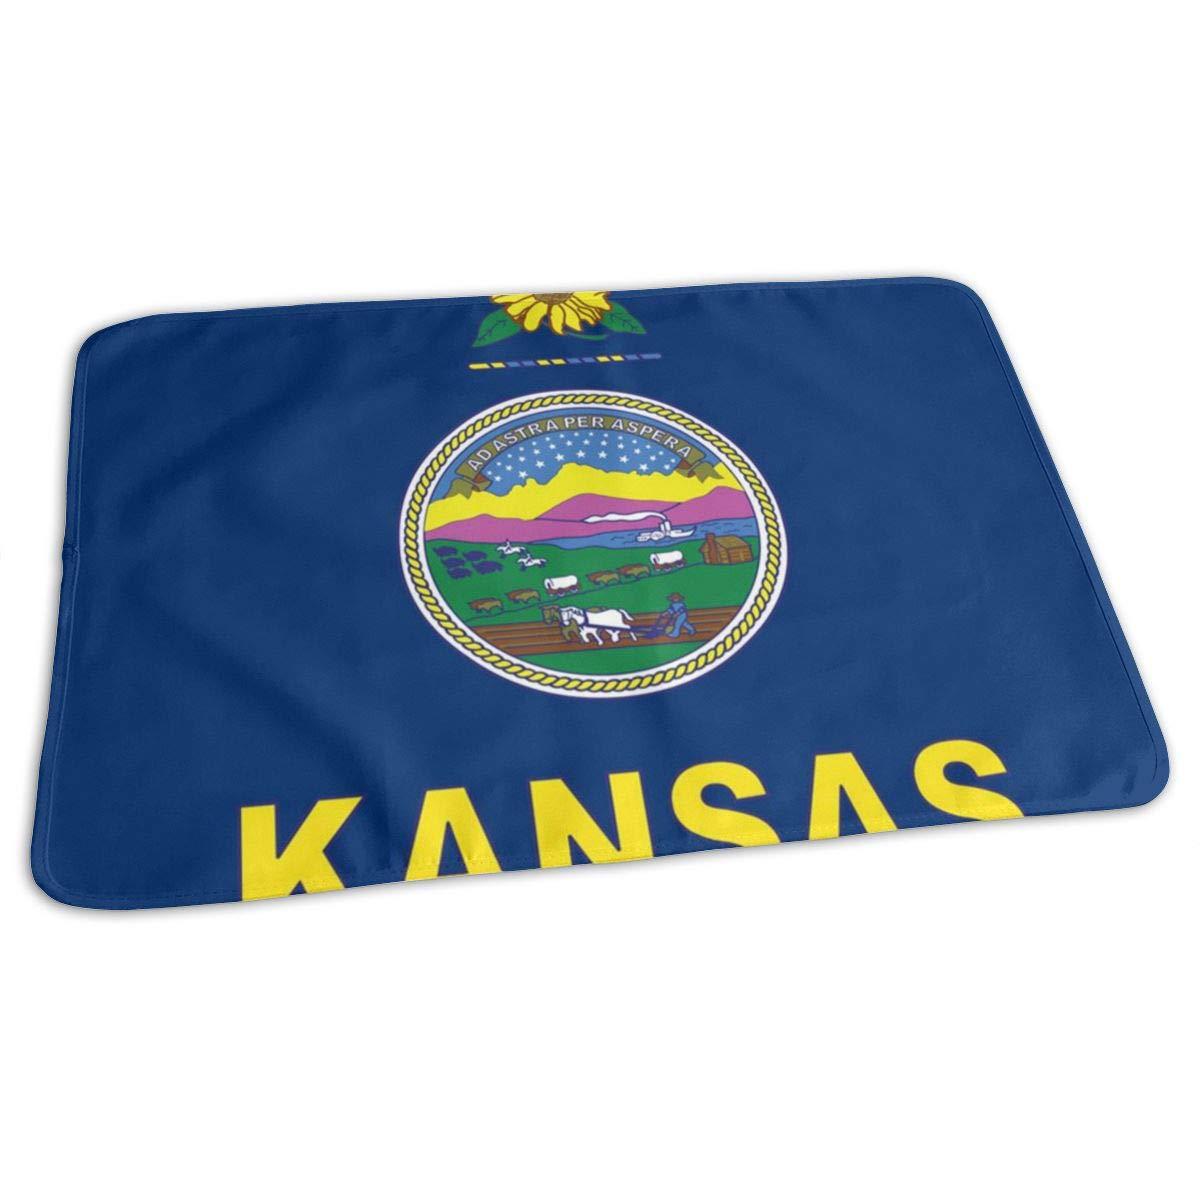 Kansas State Flag Baby Changing Pad Waterproof Portable Changing Pad Home Travel 27.5¡±x19.7¡±